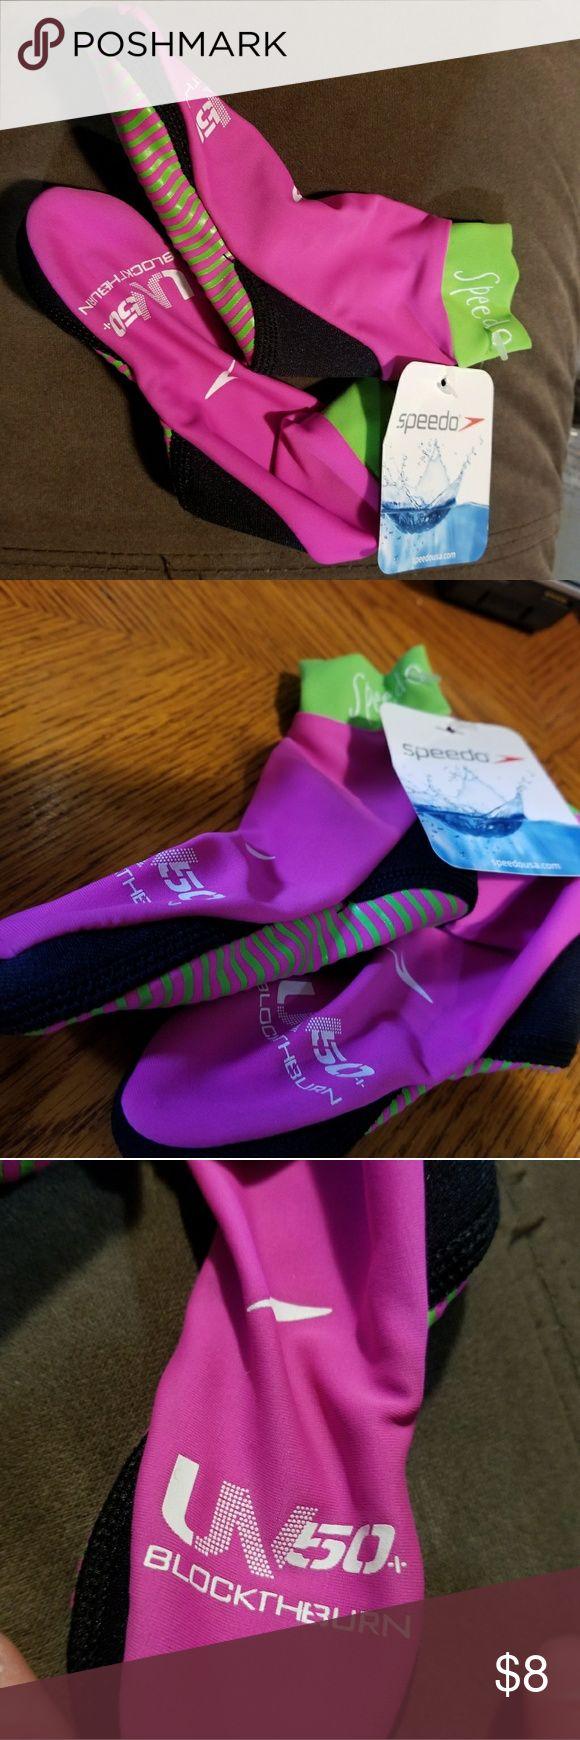 Nwt blockthburn Speedo kids water socks size S New with tags Speedo blockthburn size small girls. Speedo Shoes Water Shoes